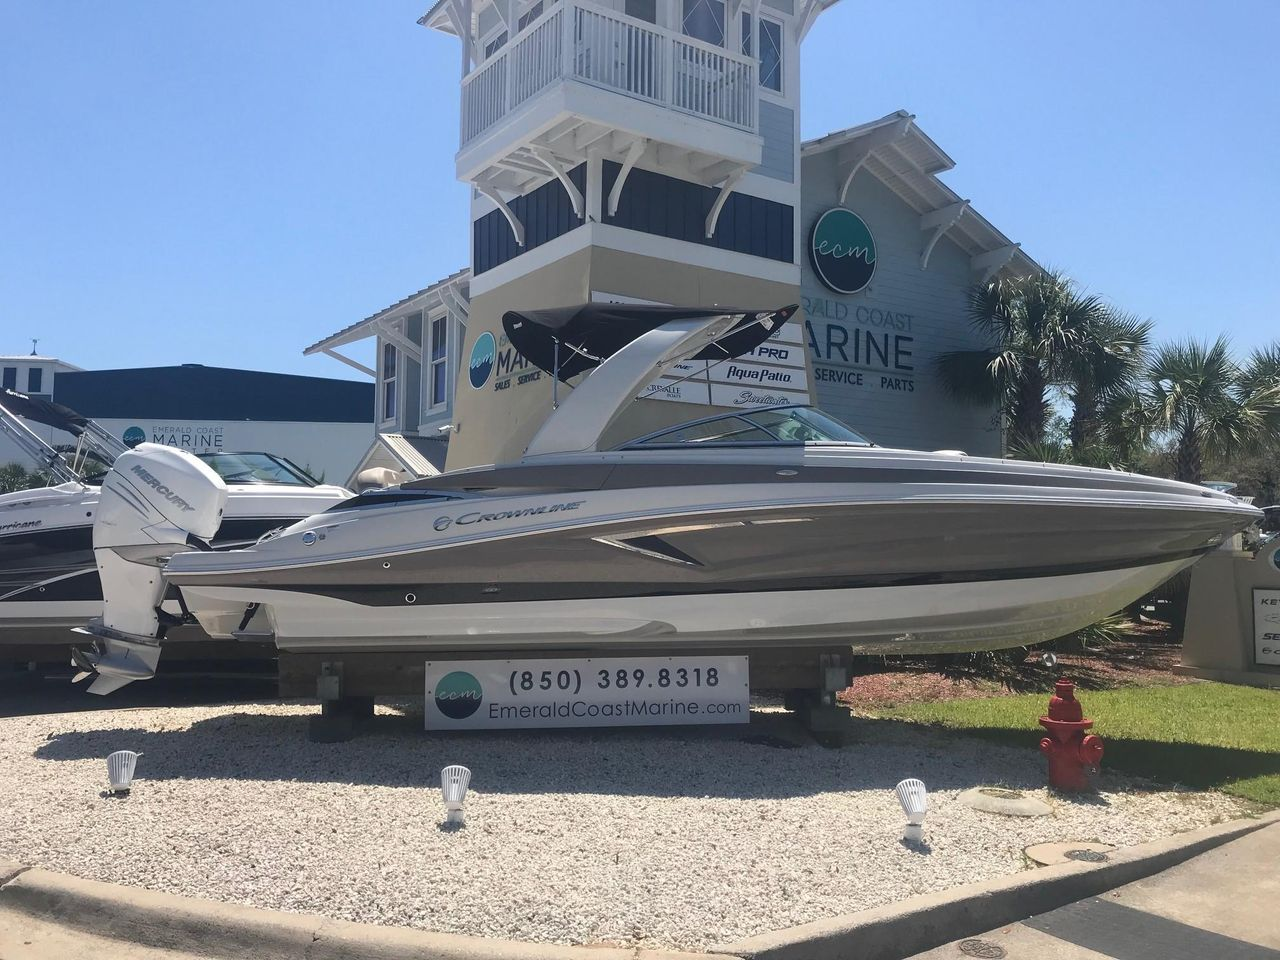 2019 New Crownline Eclipse E290 XSS Bowrider Boat For Sale